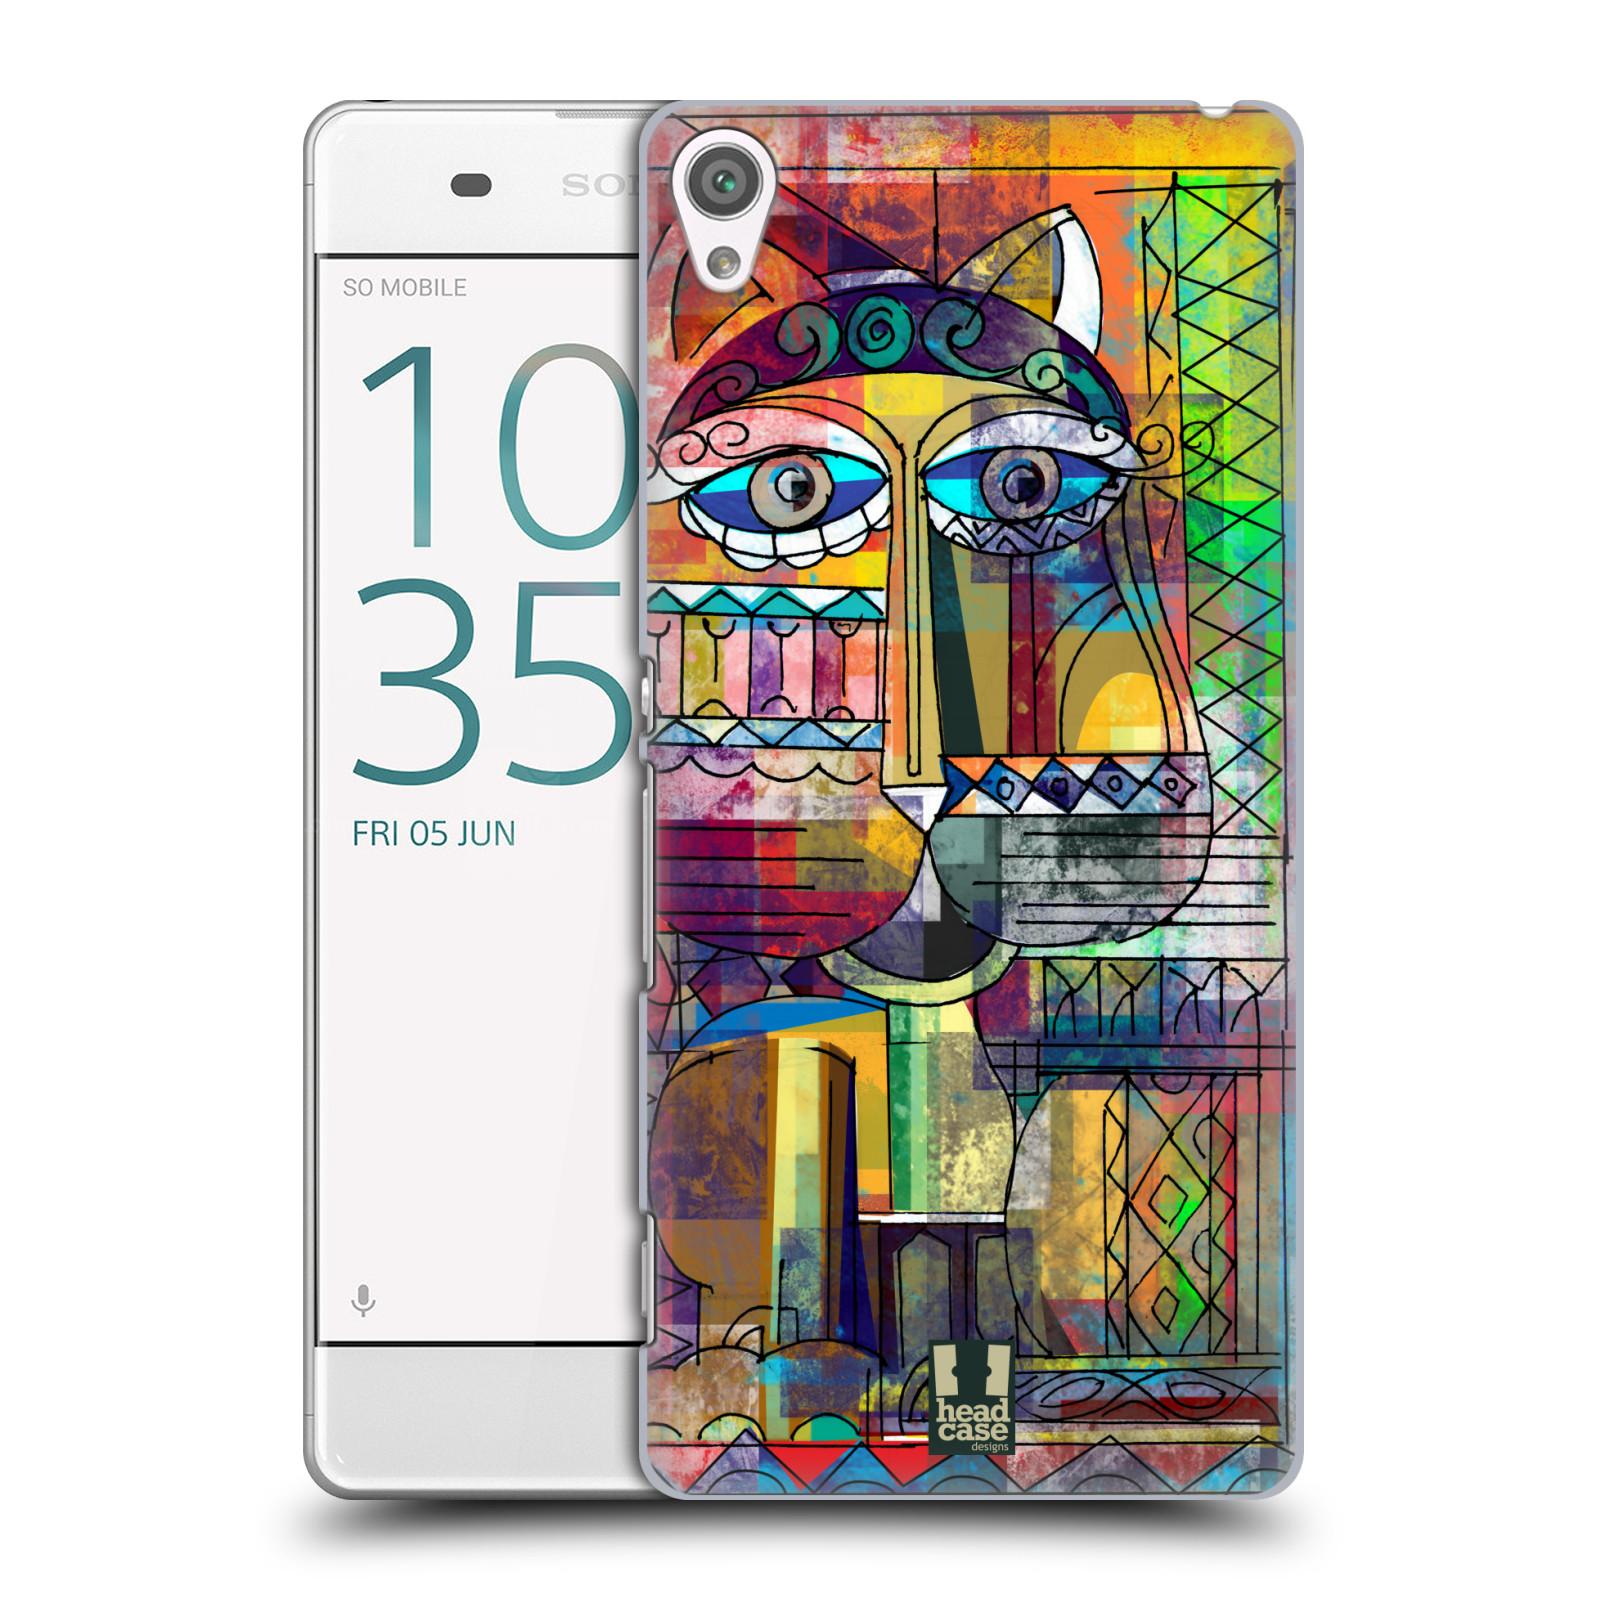 Plastové pouzdro na mobil Sony Xperia XA HEAD CASE AZTEC KORAT